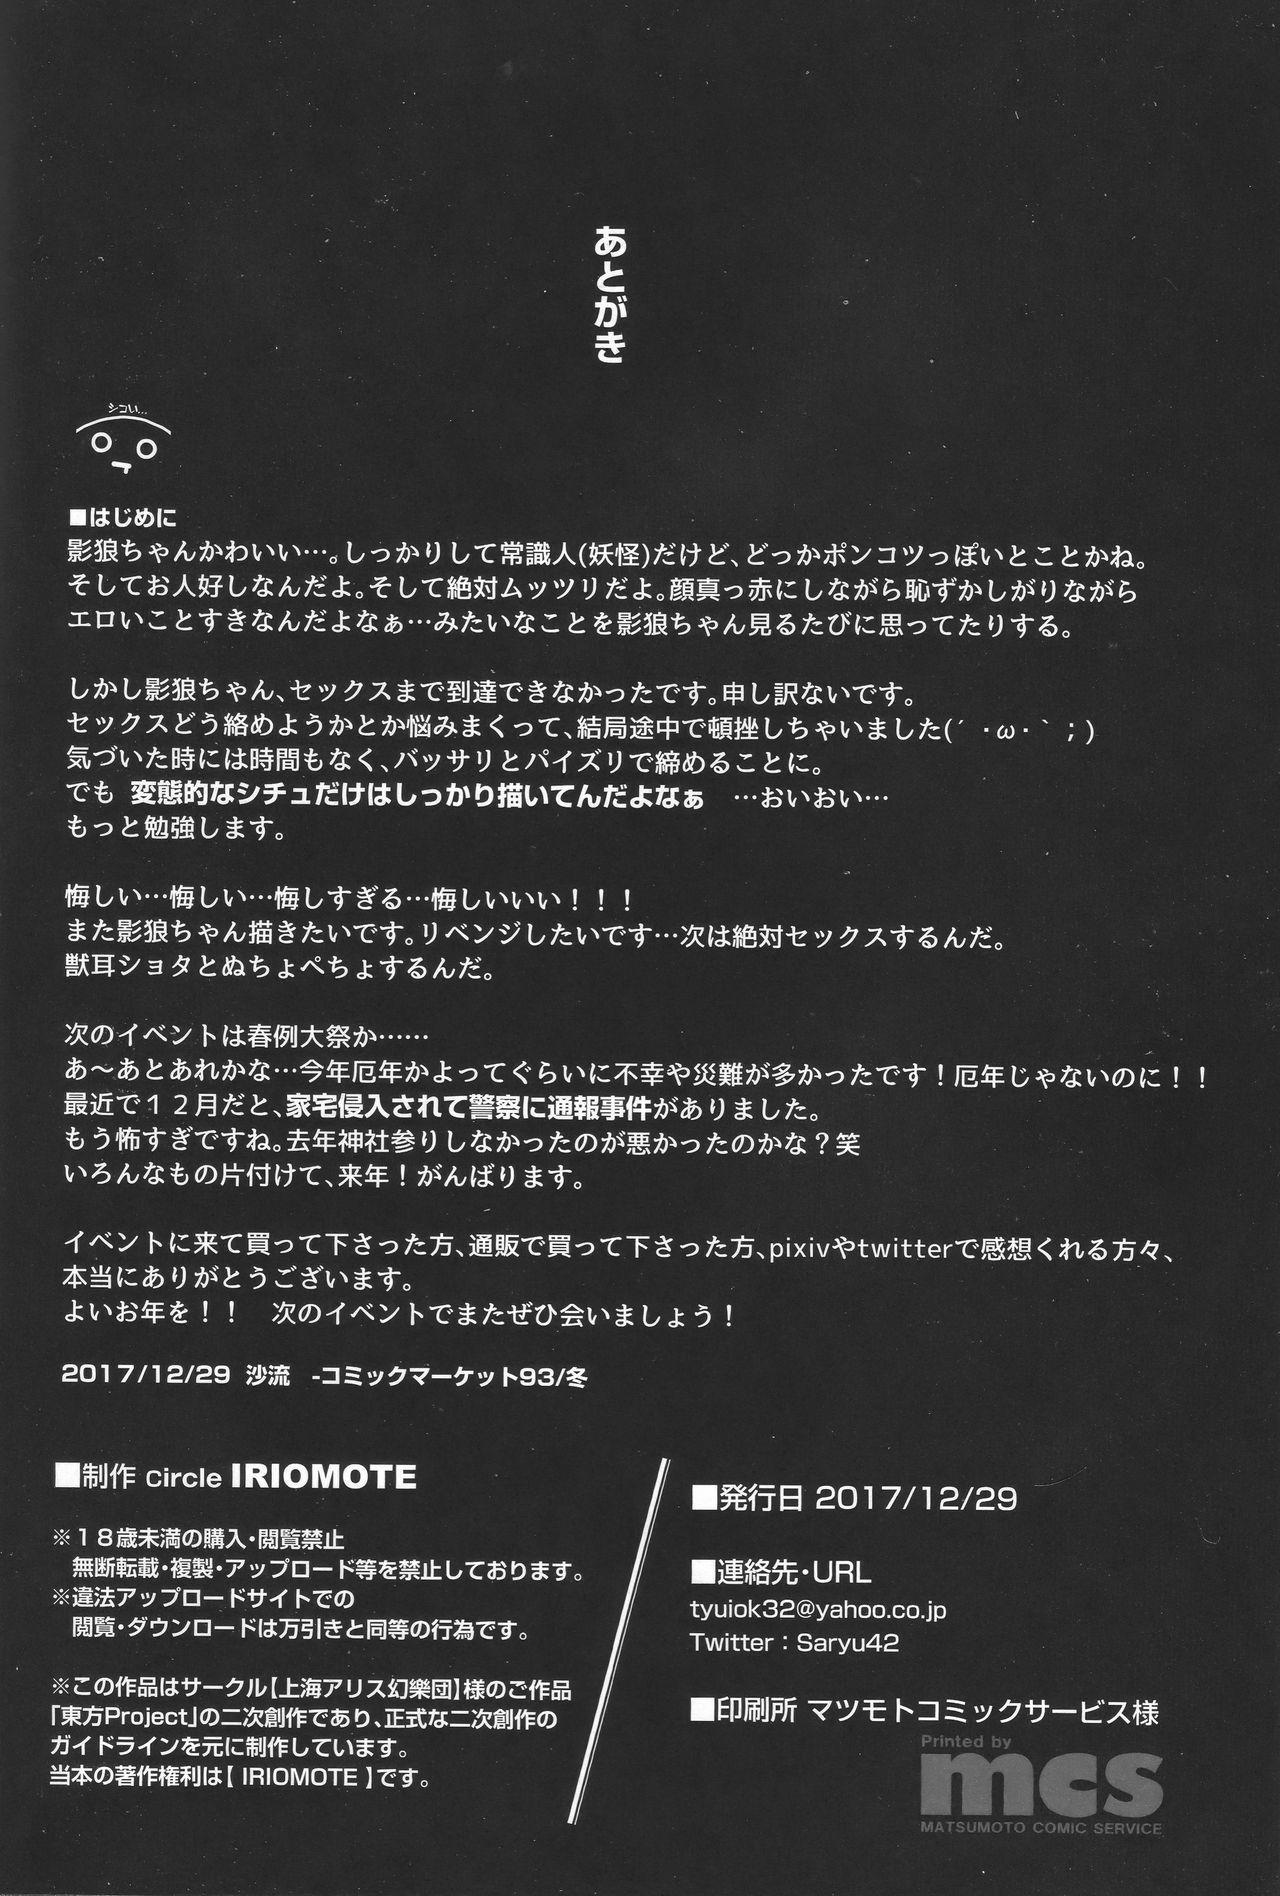 Kagerou Onee-san to Hatsujou Hoikuki + C93 Omake Bon 19